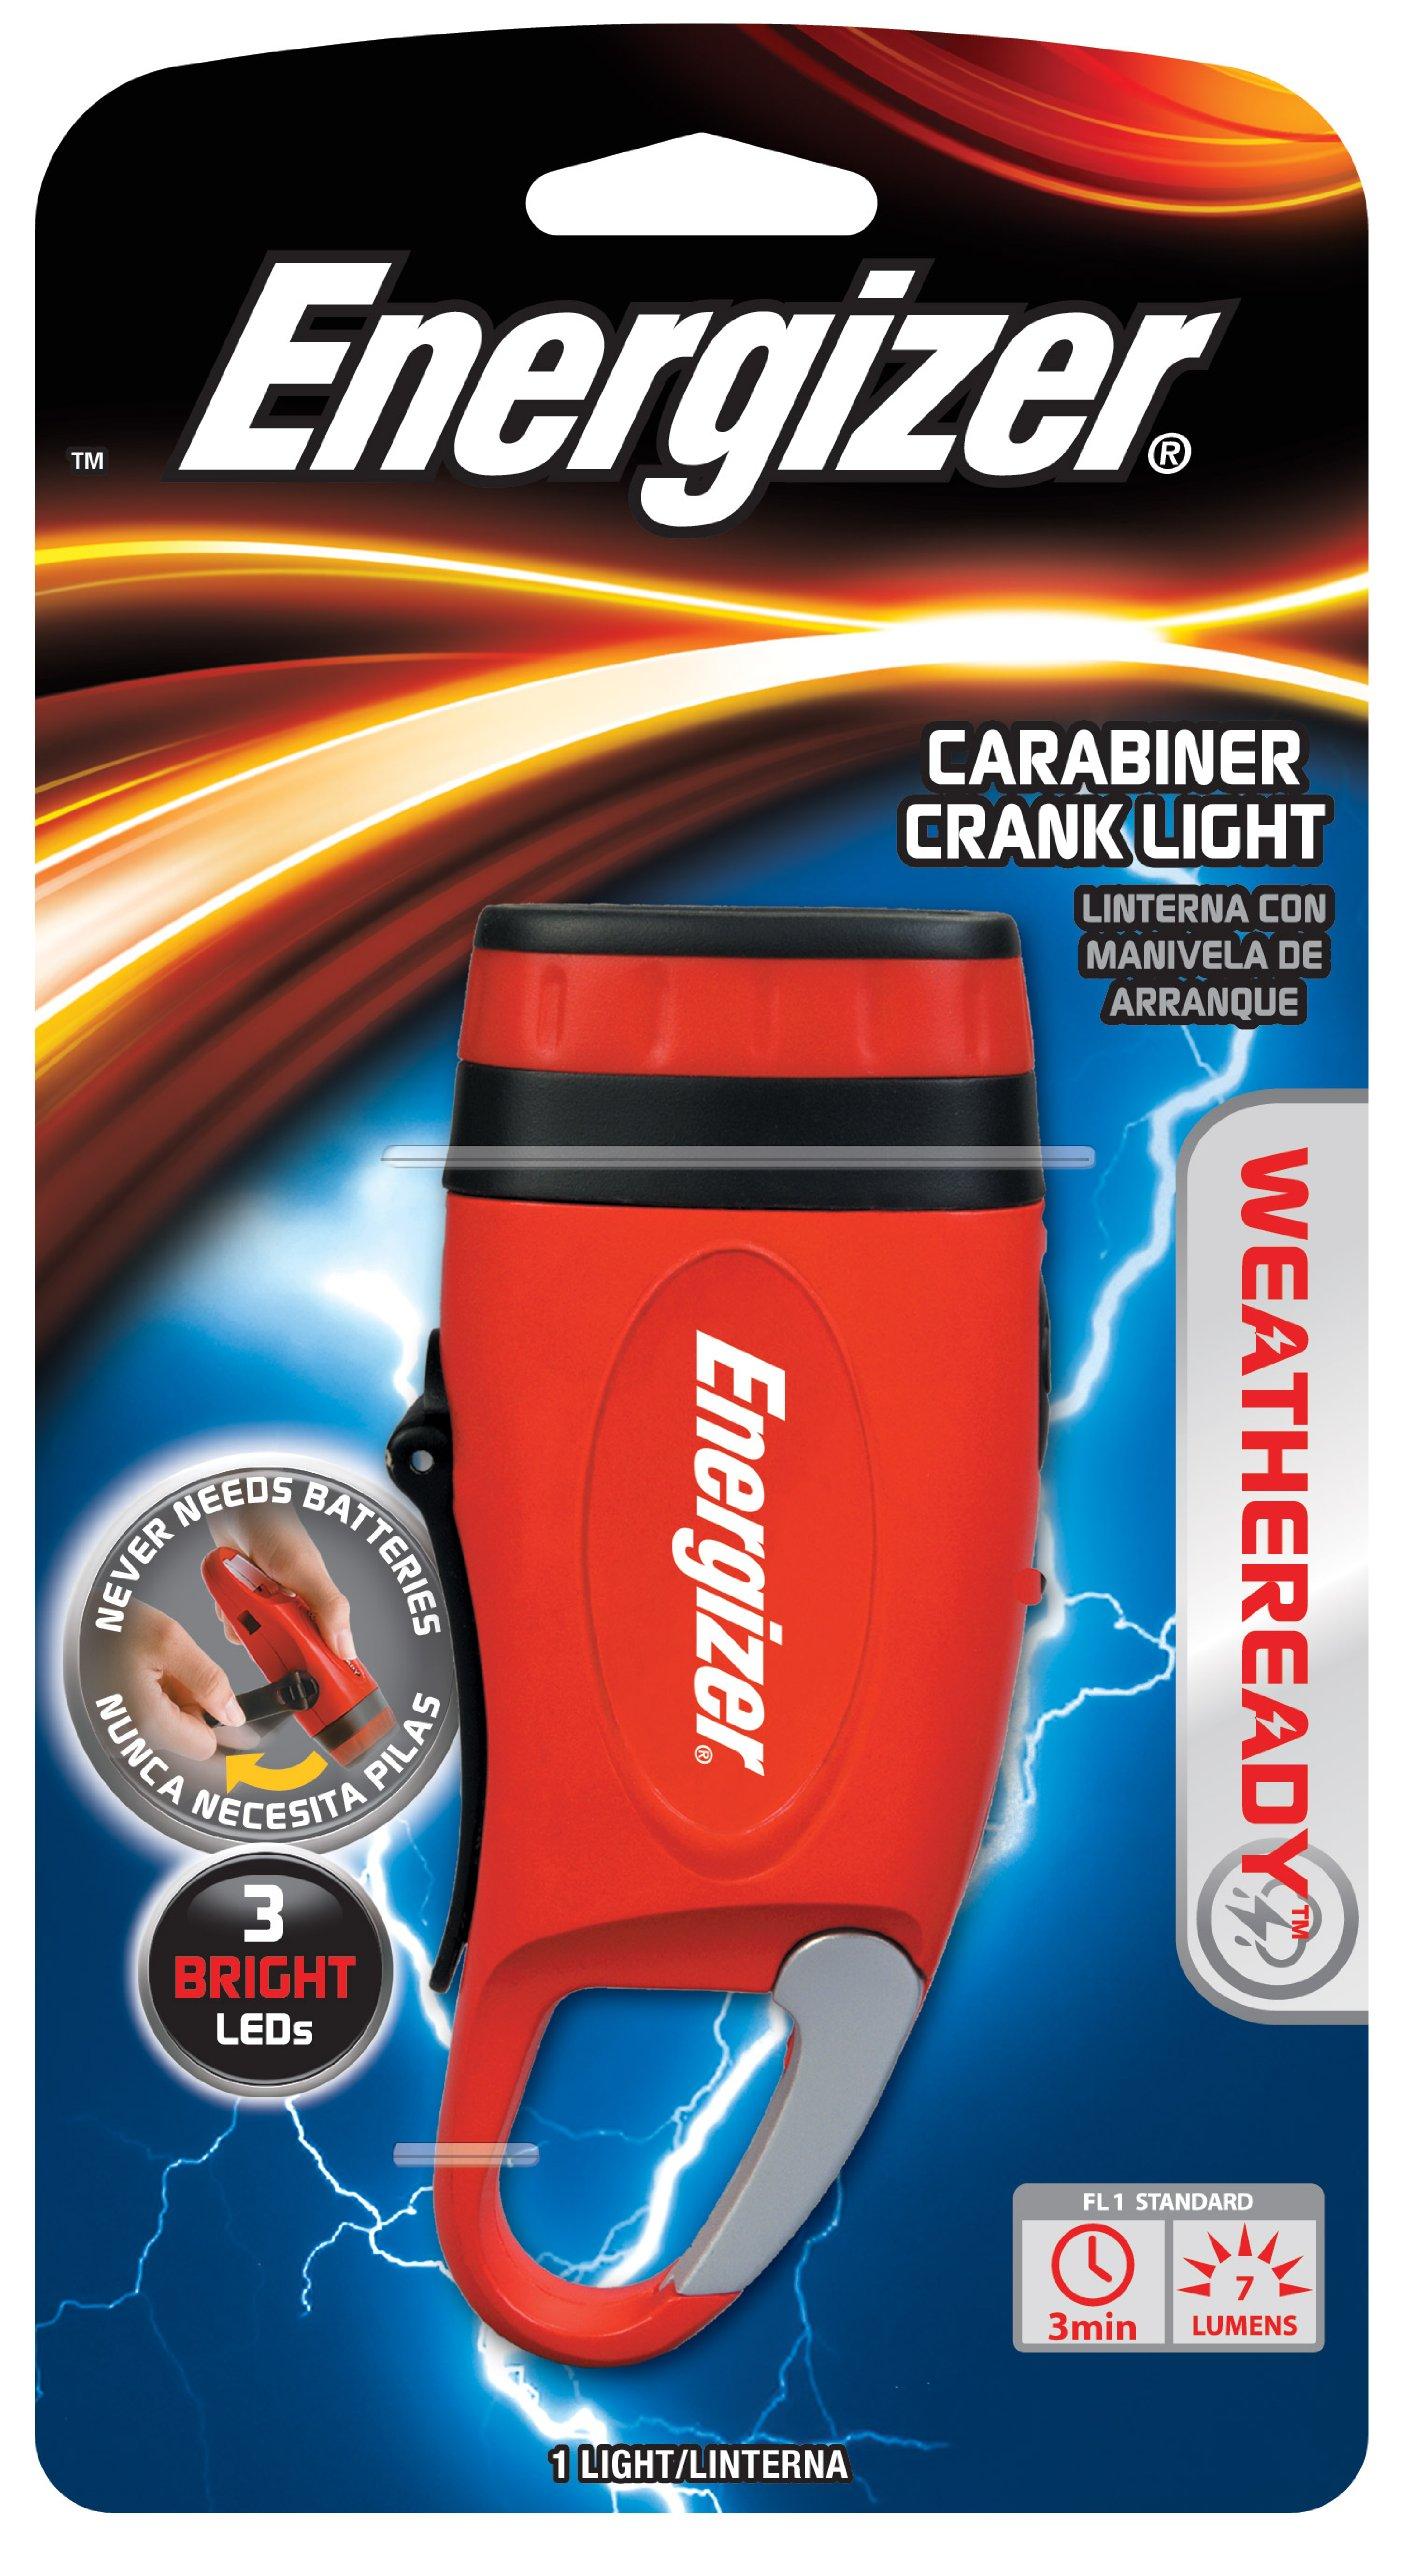 Energizer Weatheready 3 Led Carabineer Rechargeable Crank